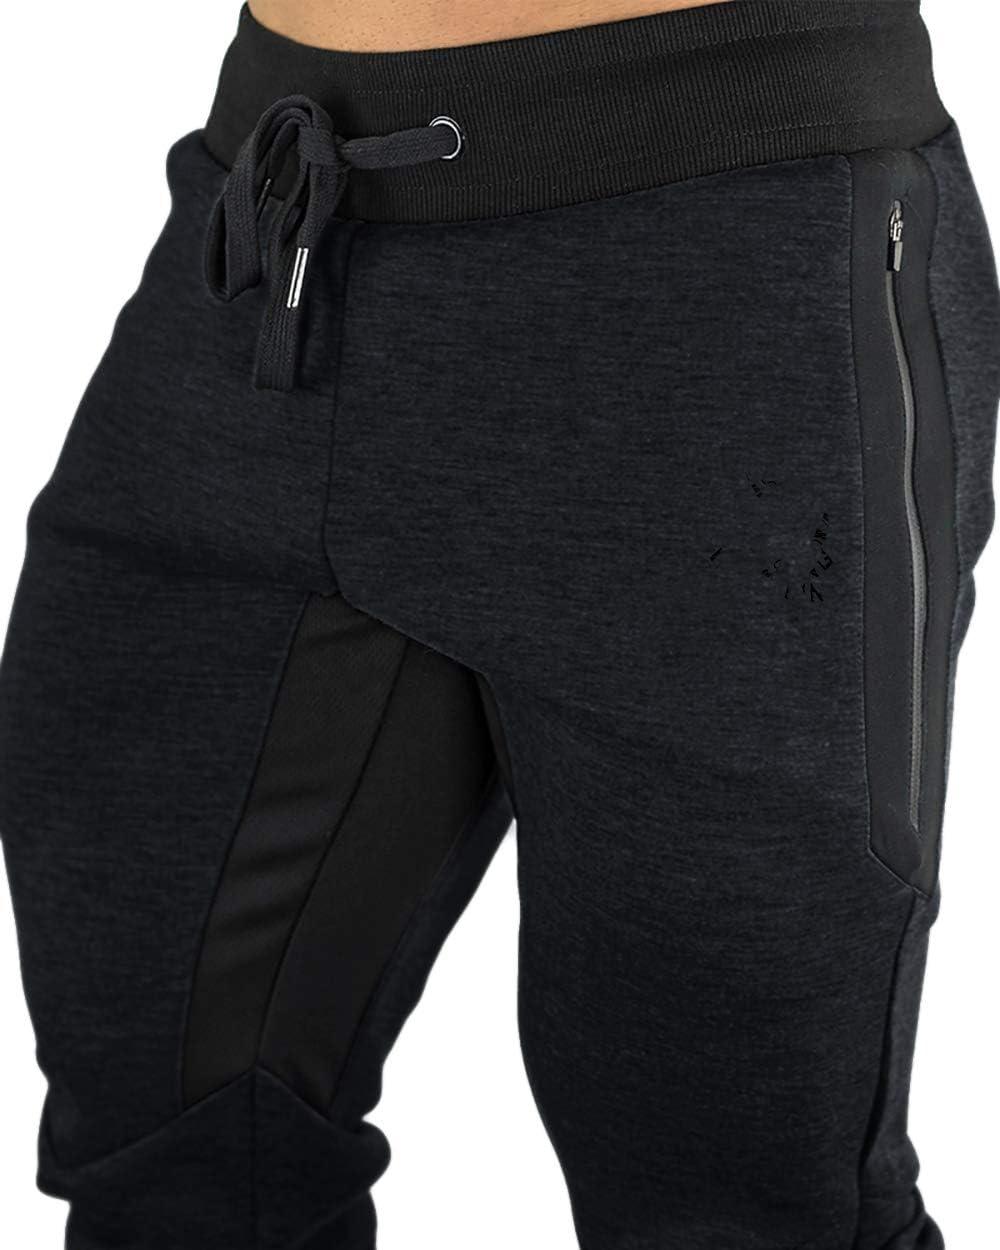 FASKUNOIE Mens Cotton Casual shorts 3//4 Jogger Capri Pants Breathable Below Knee Short Pants with Three Pockets